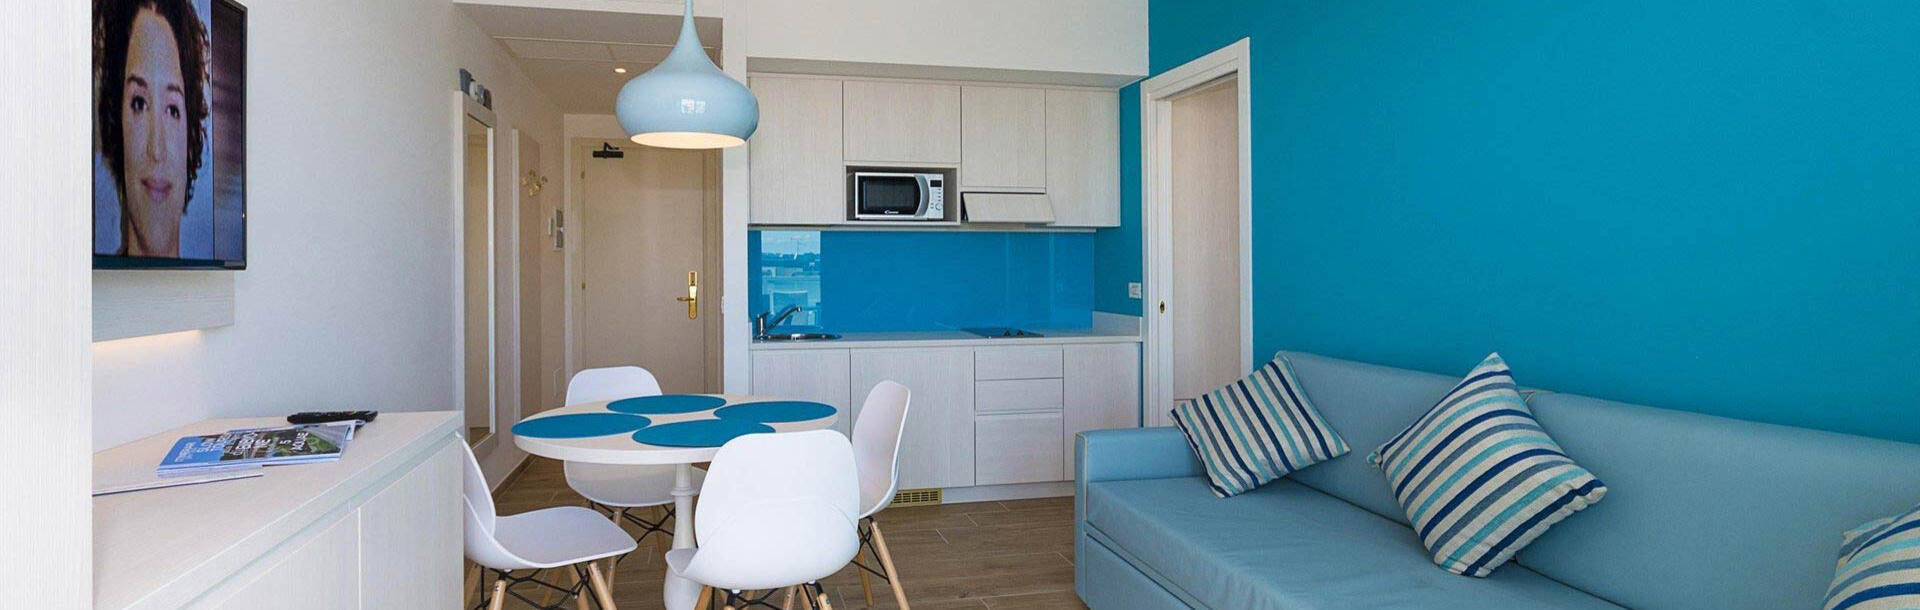 hotel-montecarlo pl family-living-suite-bibione 014